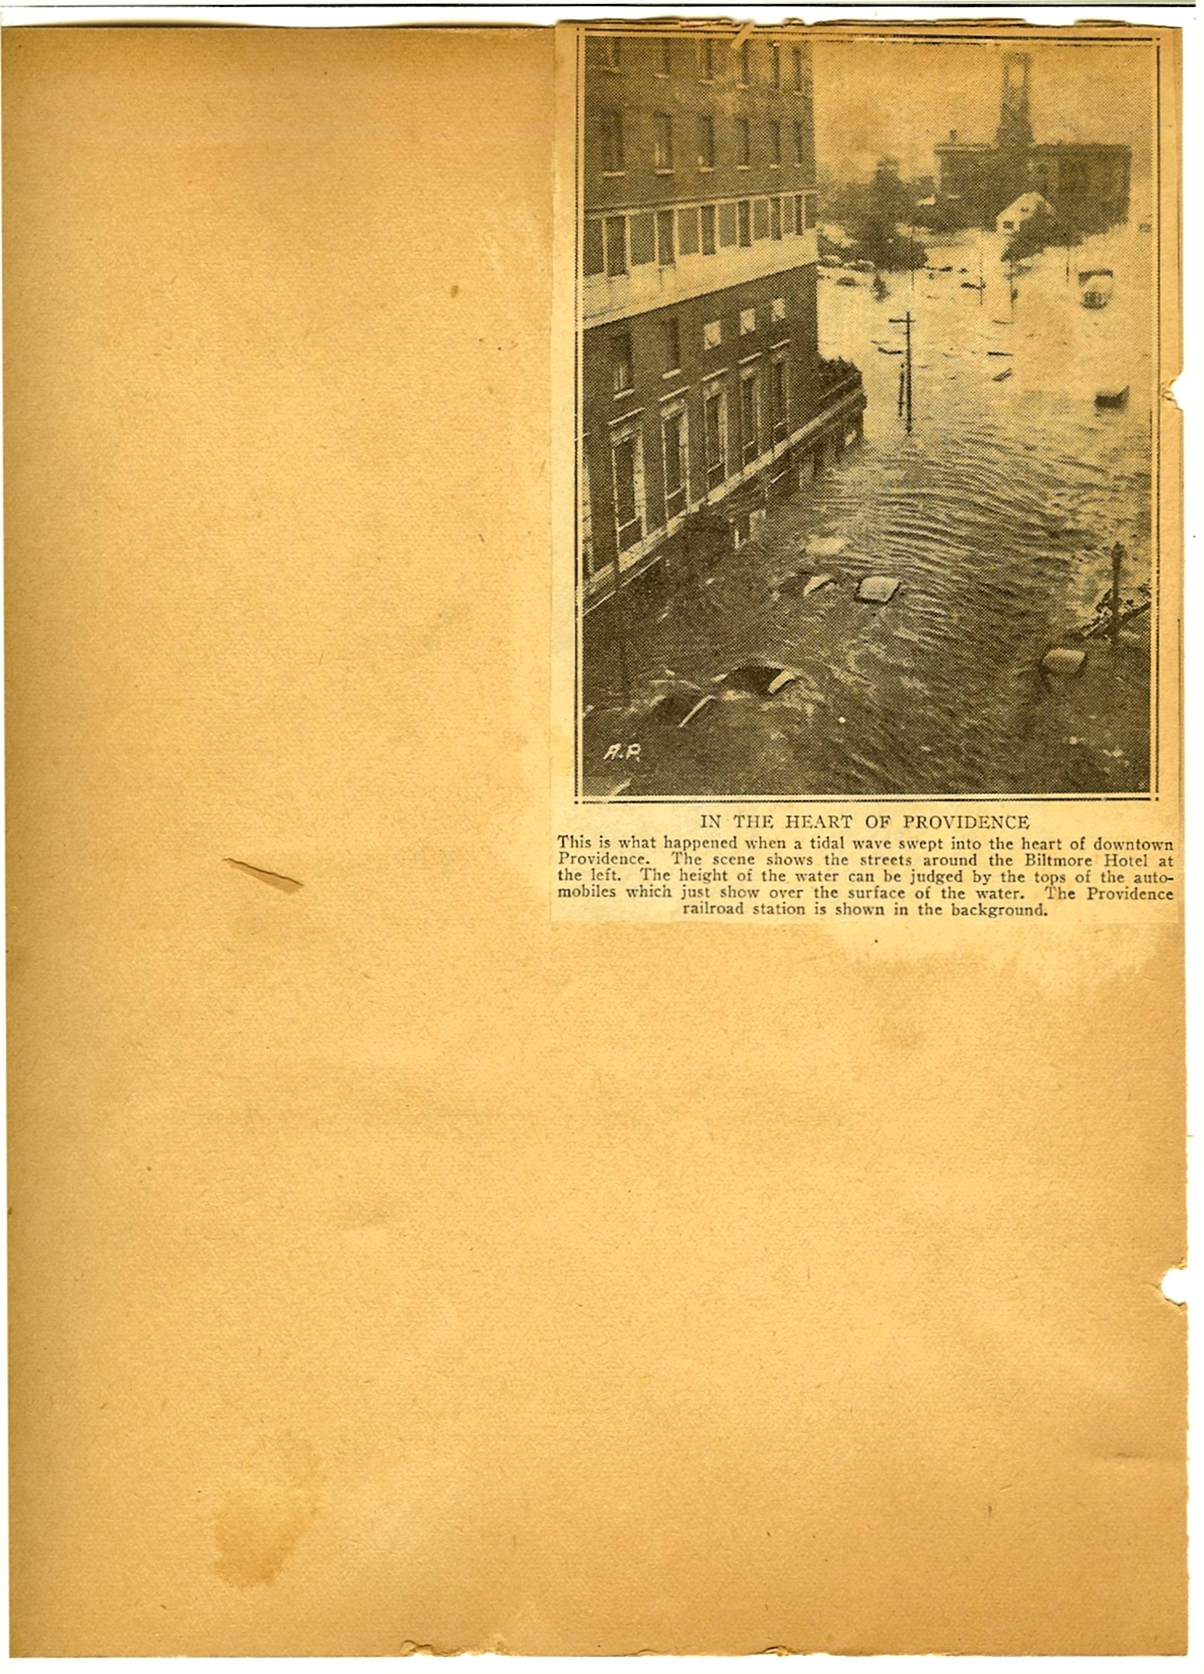 The 1938 Hurricane photos p38